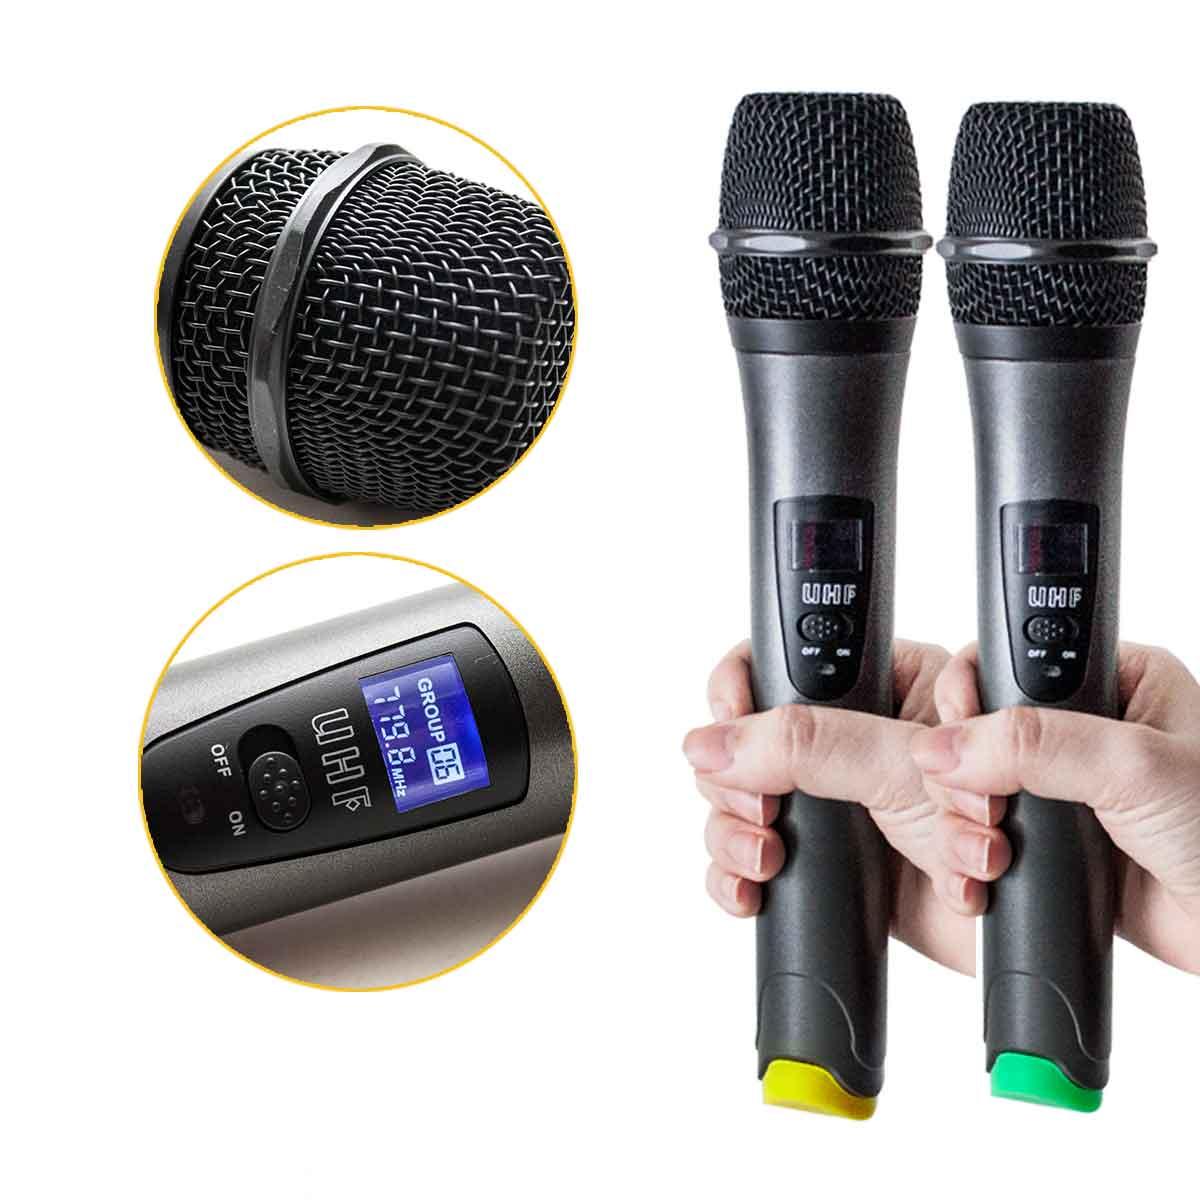 Microfone Sem Fio Duplo Wireless Uhf Digital Bivolt 50mt